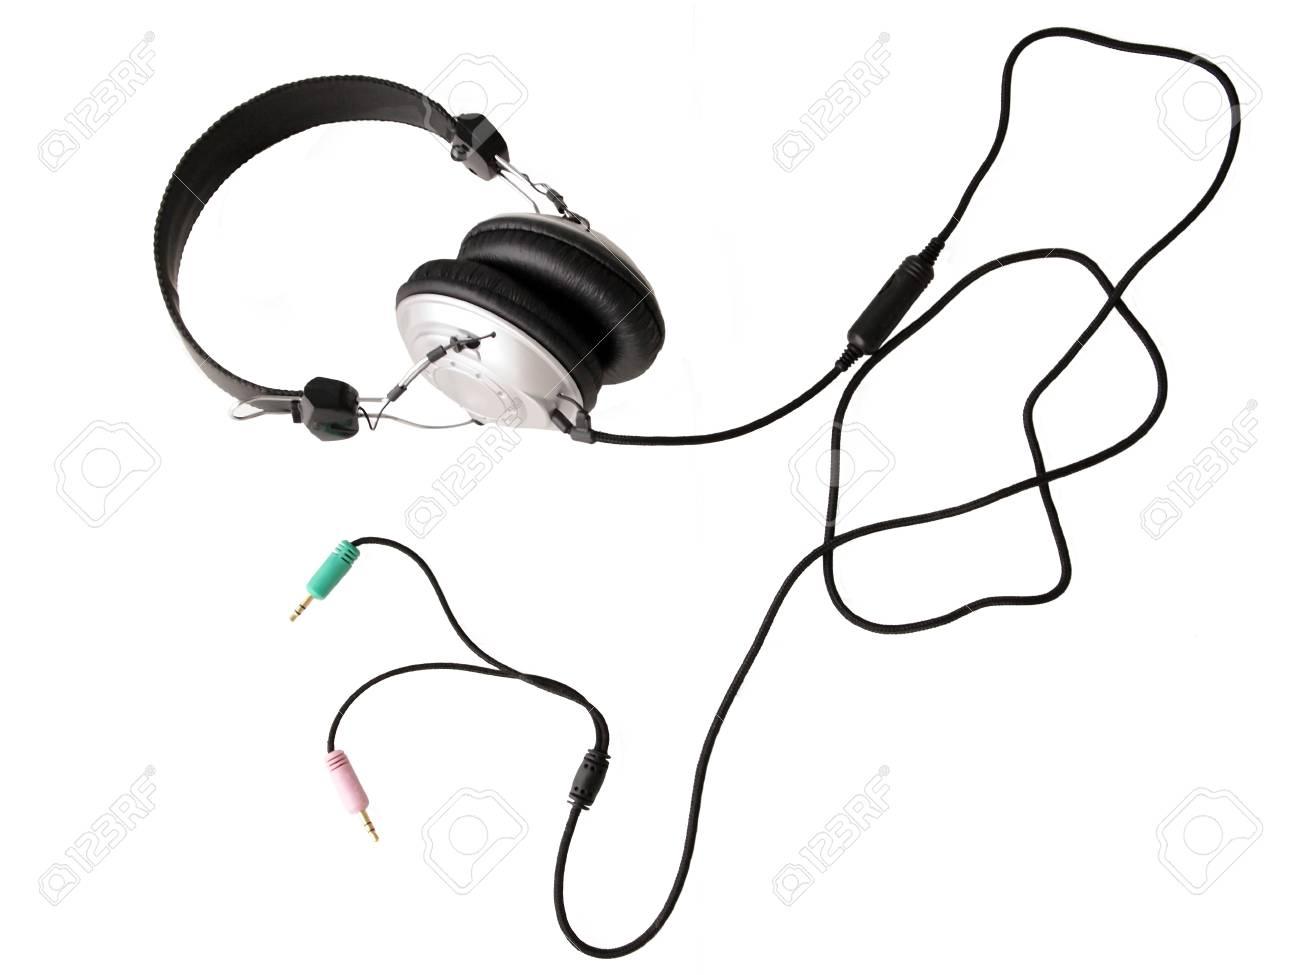 The headphones on white background Stock Photo - 13244998